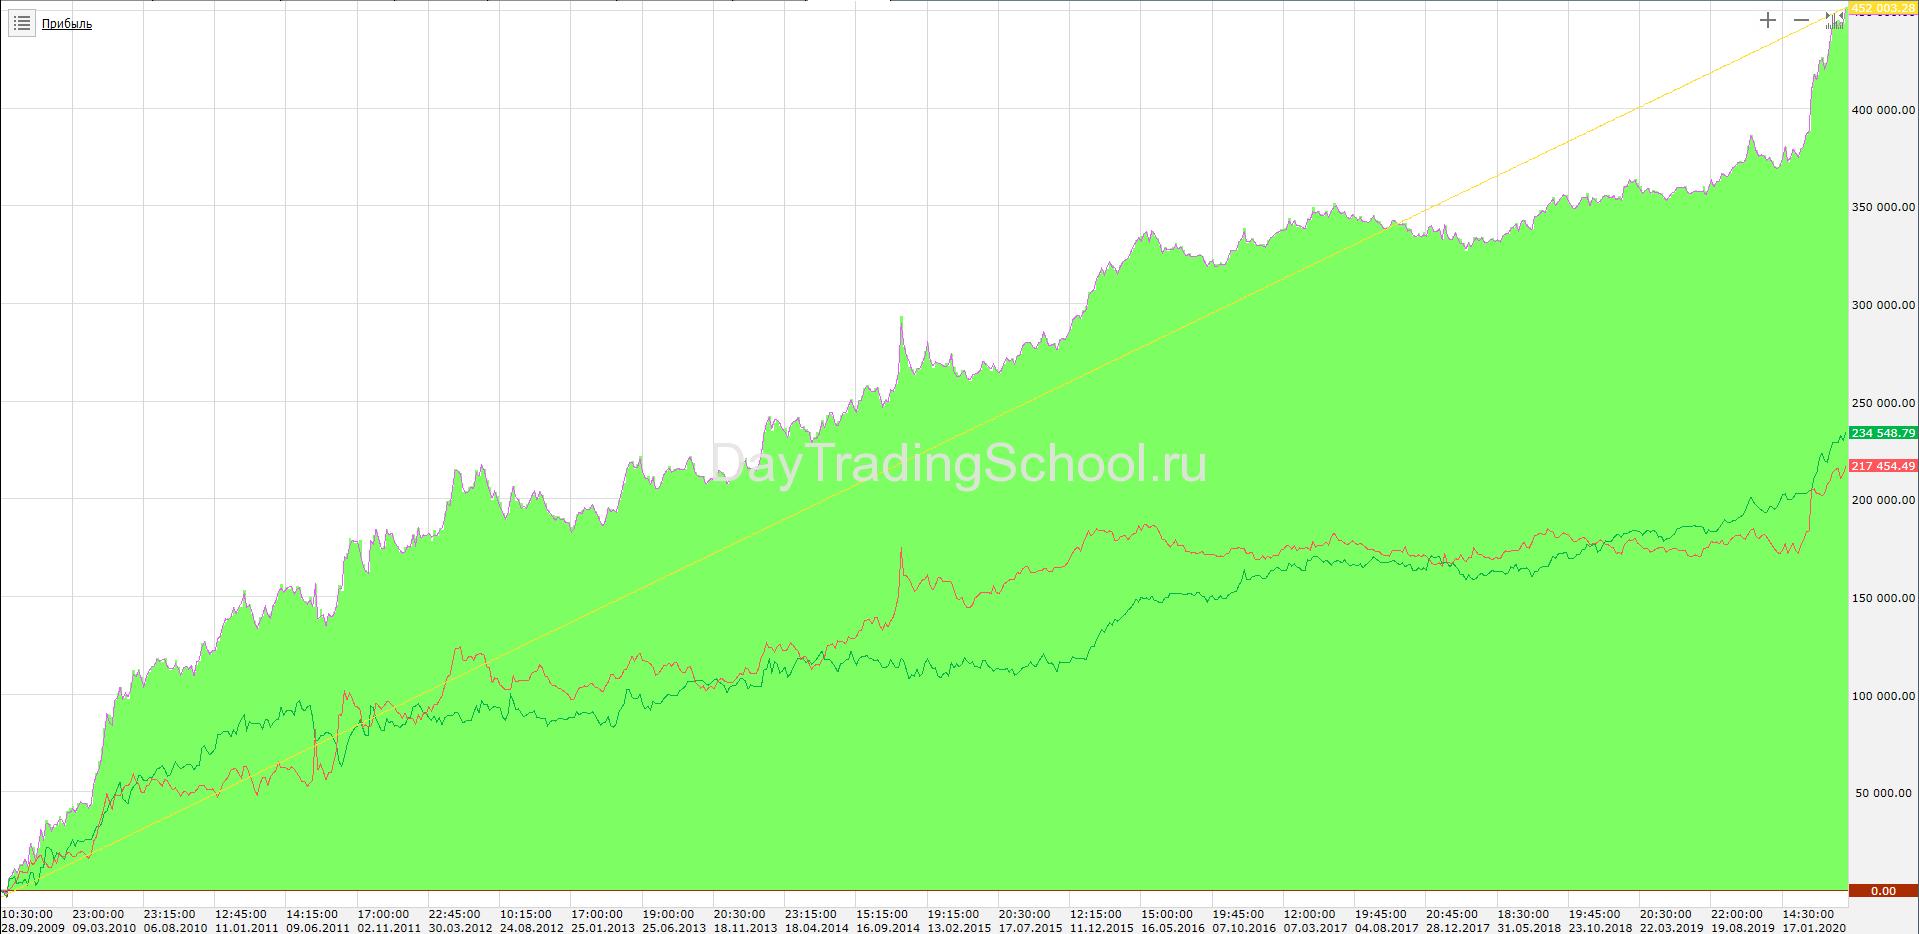 HIGH-Volatility_РТС_Доход